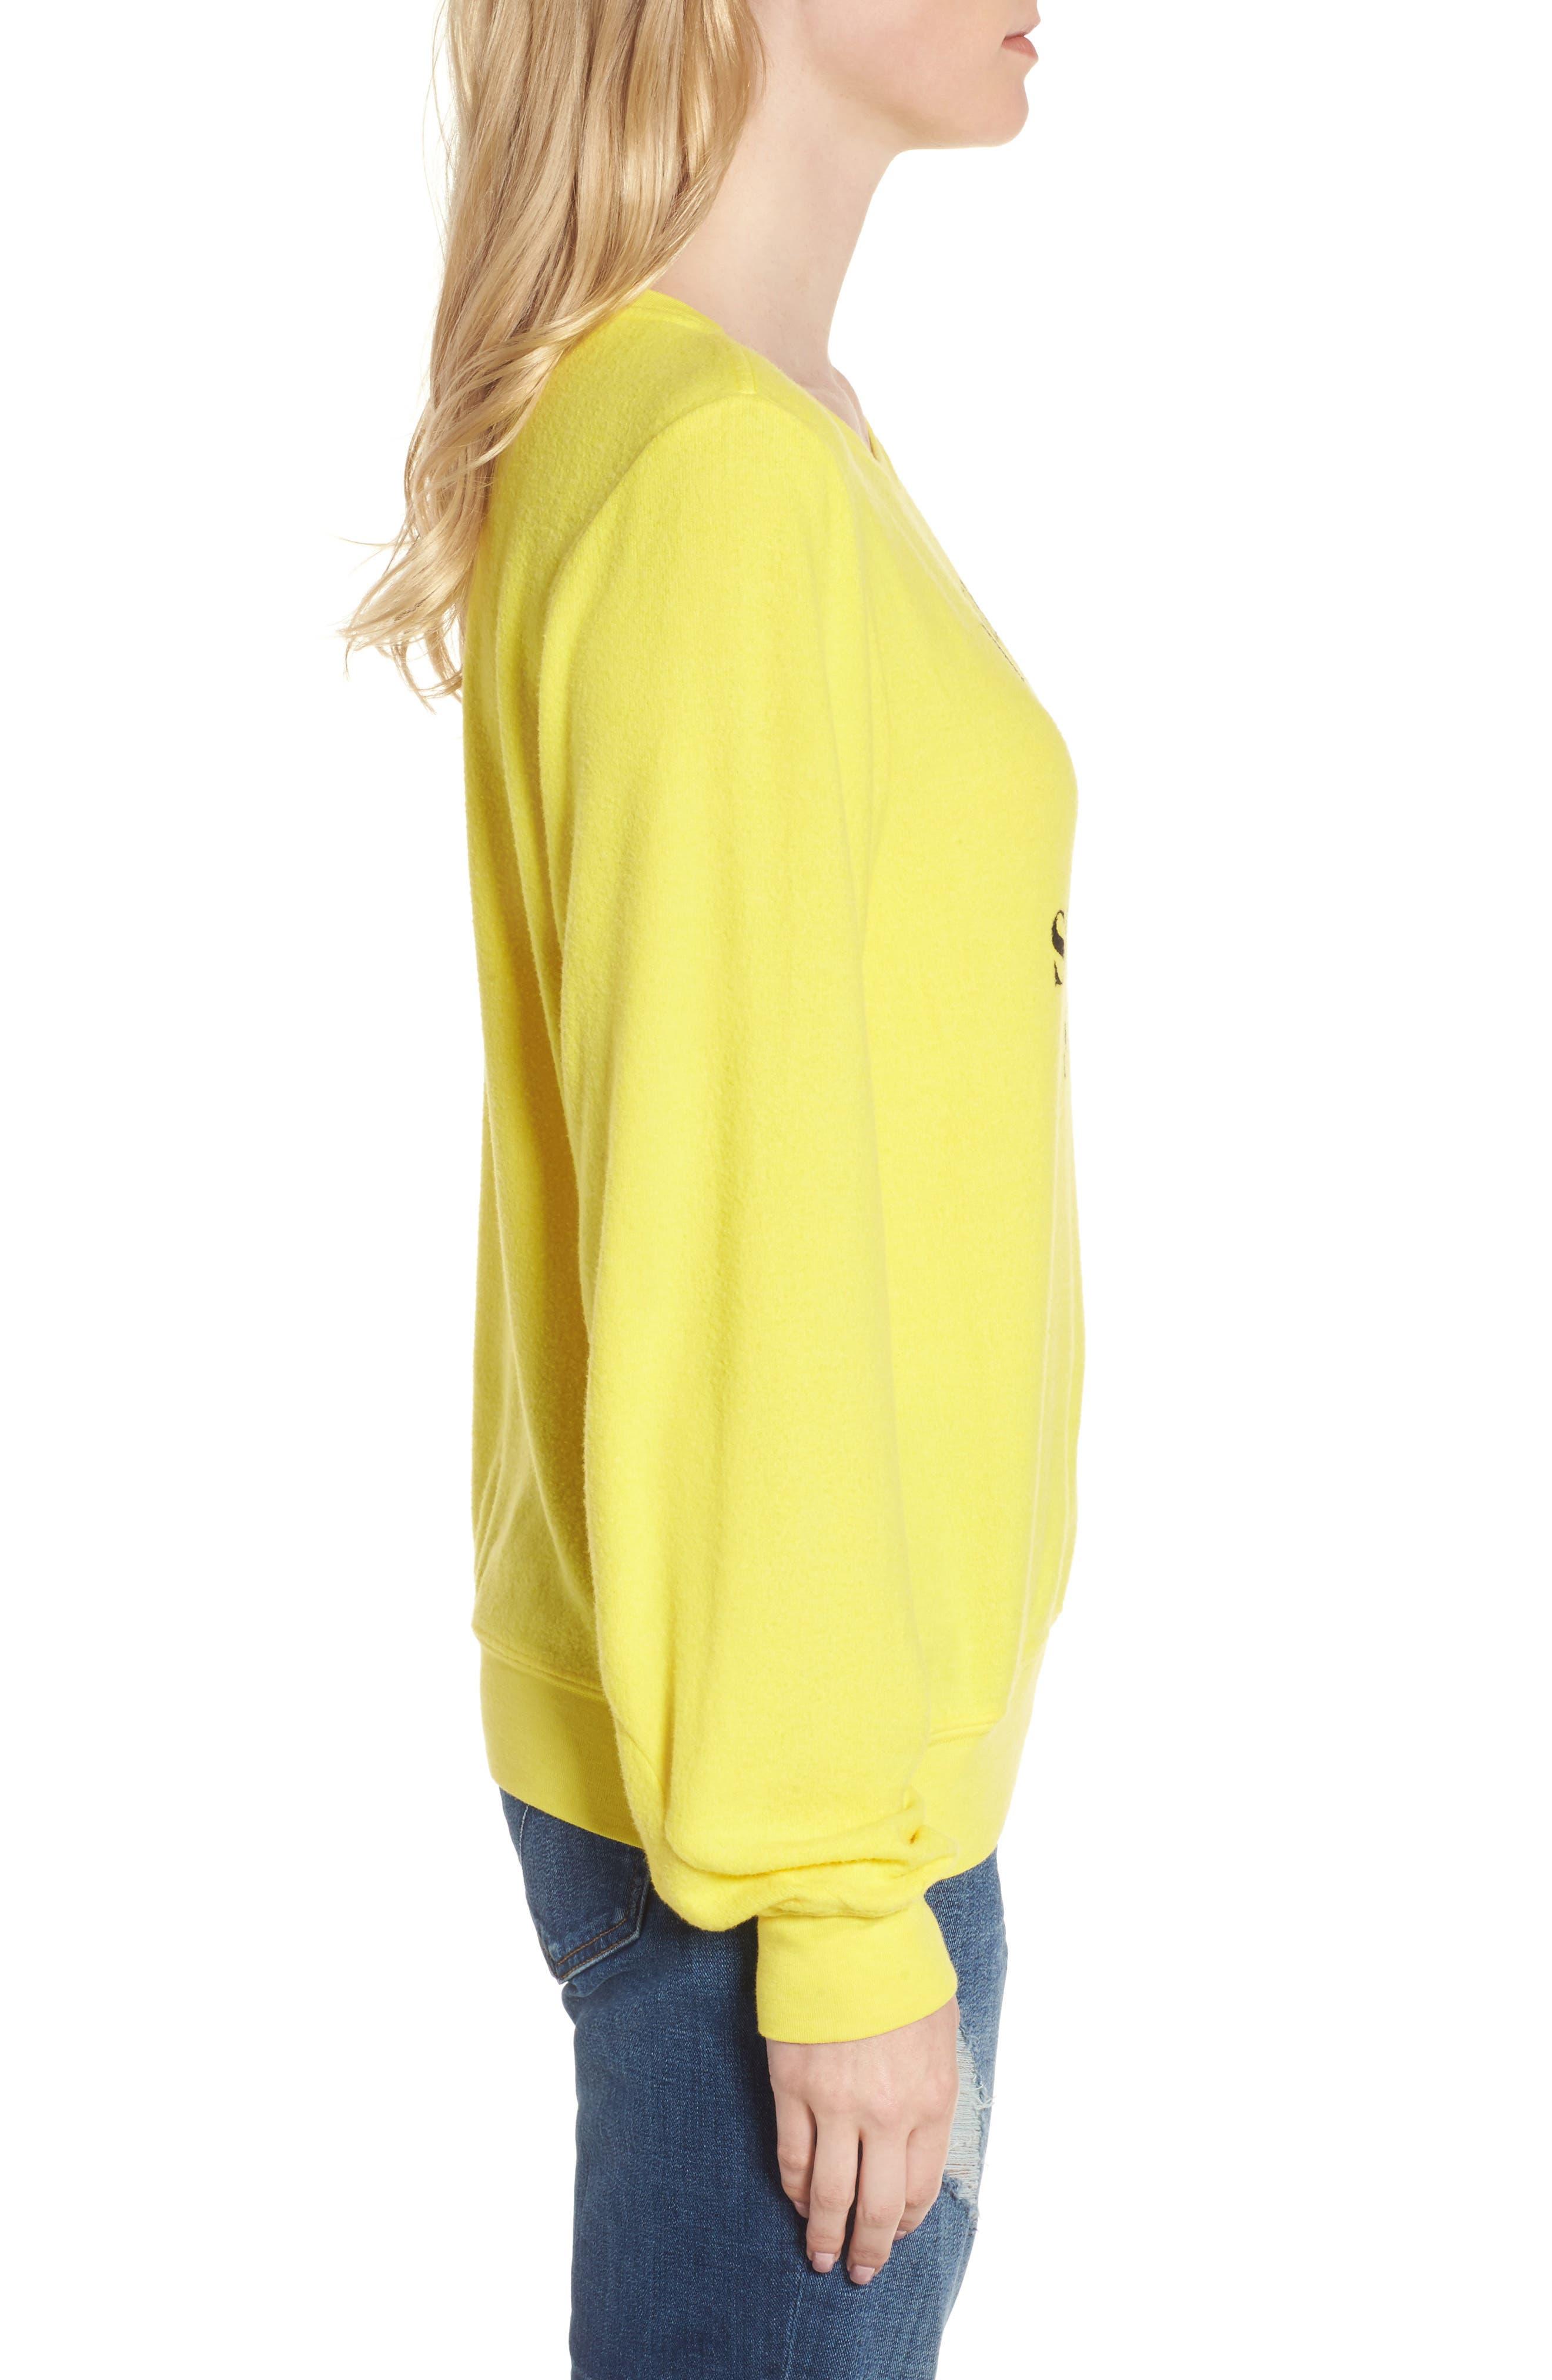 'Somewhere Sunny' Sweatshirt,                             Alternate thumbnail 3, color,                             730